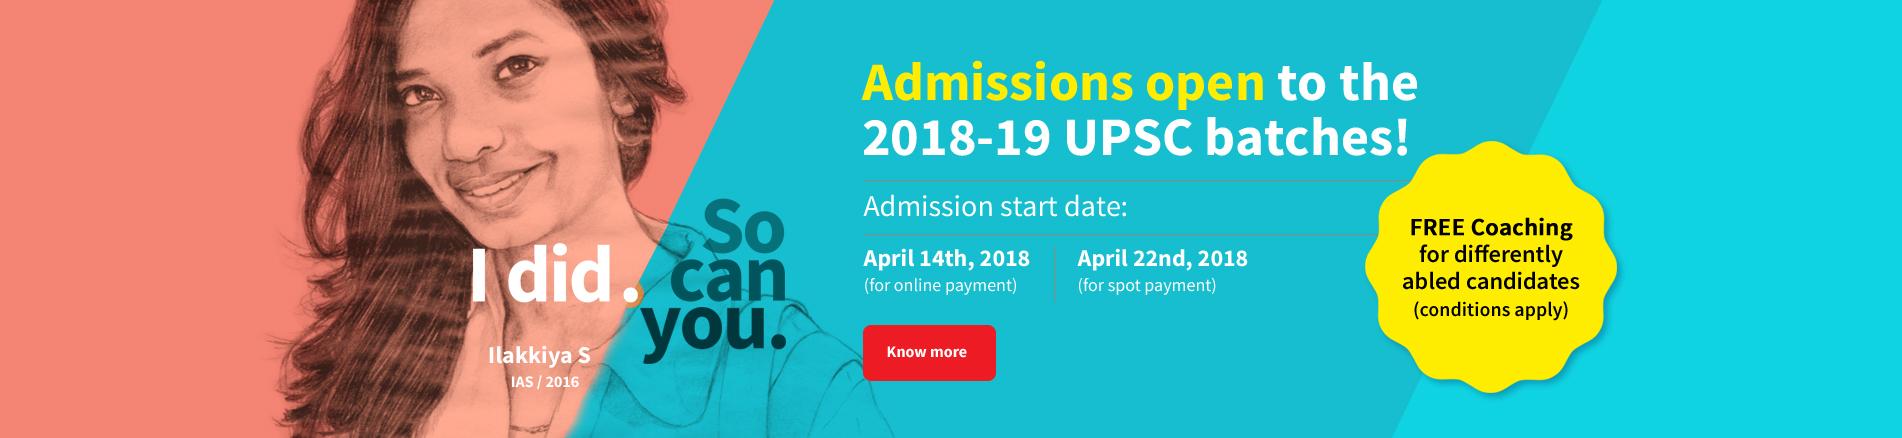 Admissions 2018